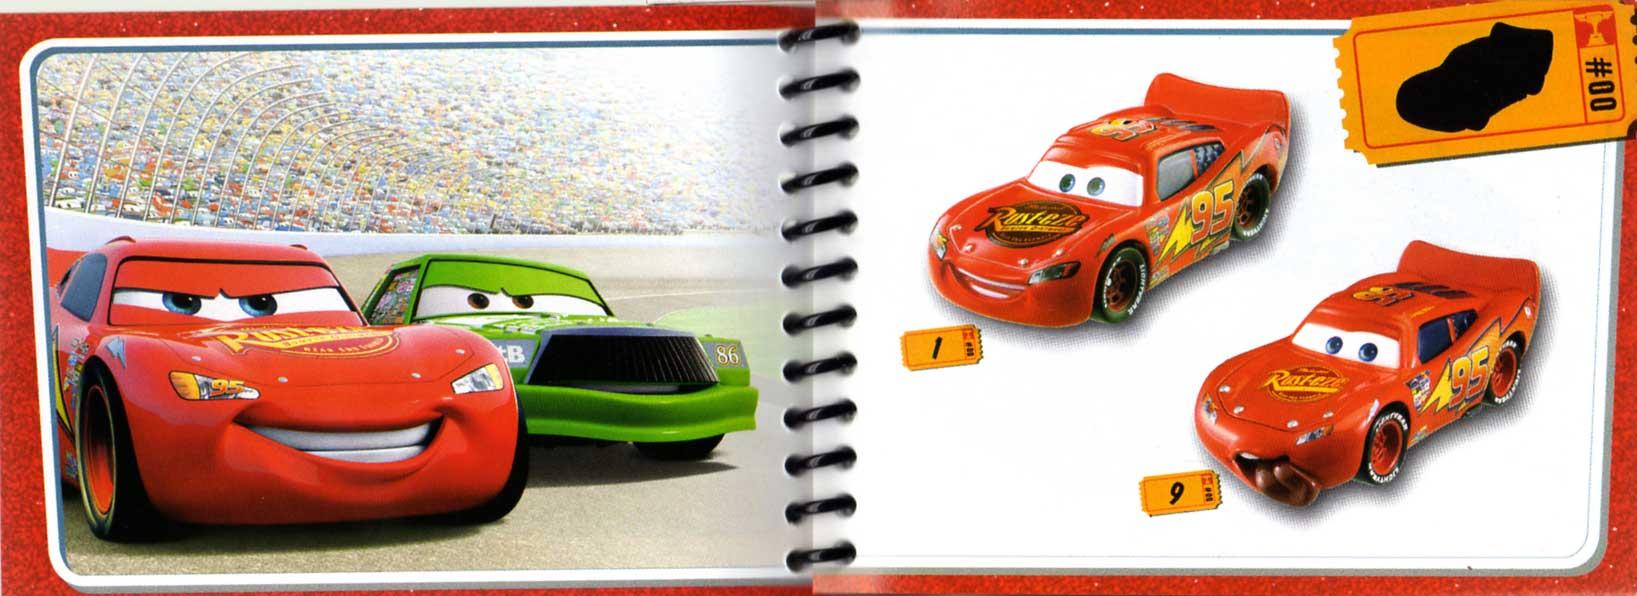 Catalogue Race O Rama page 26 - 27